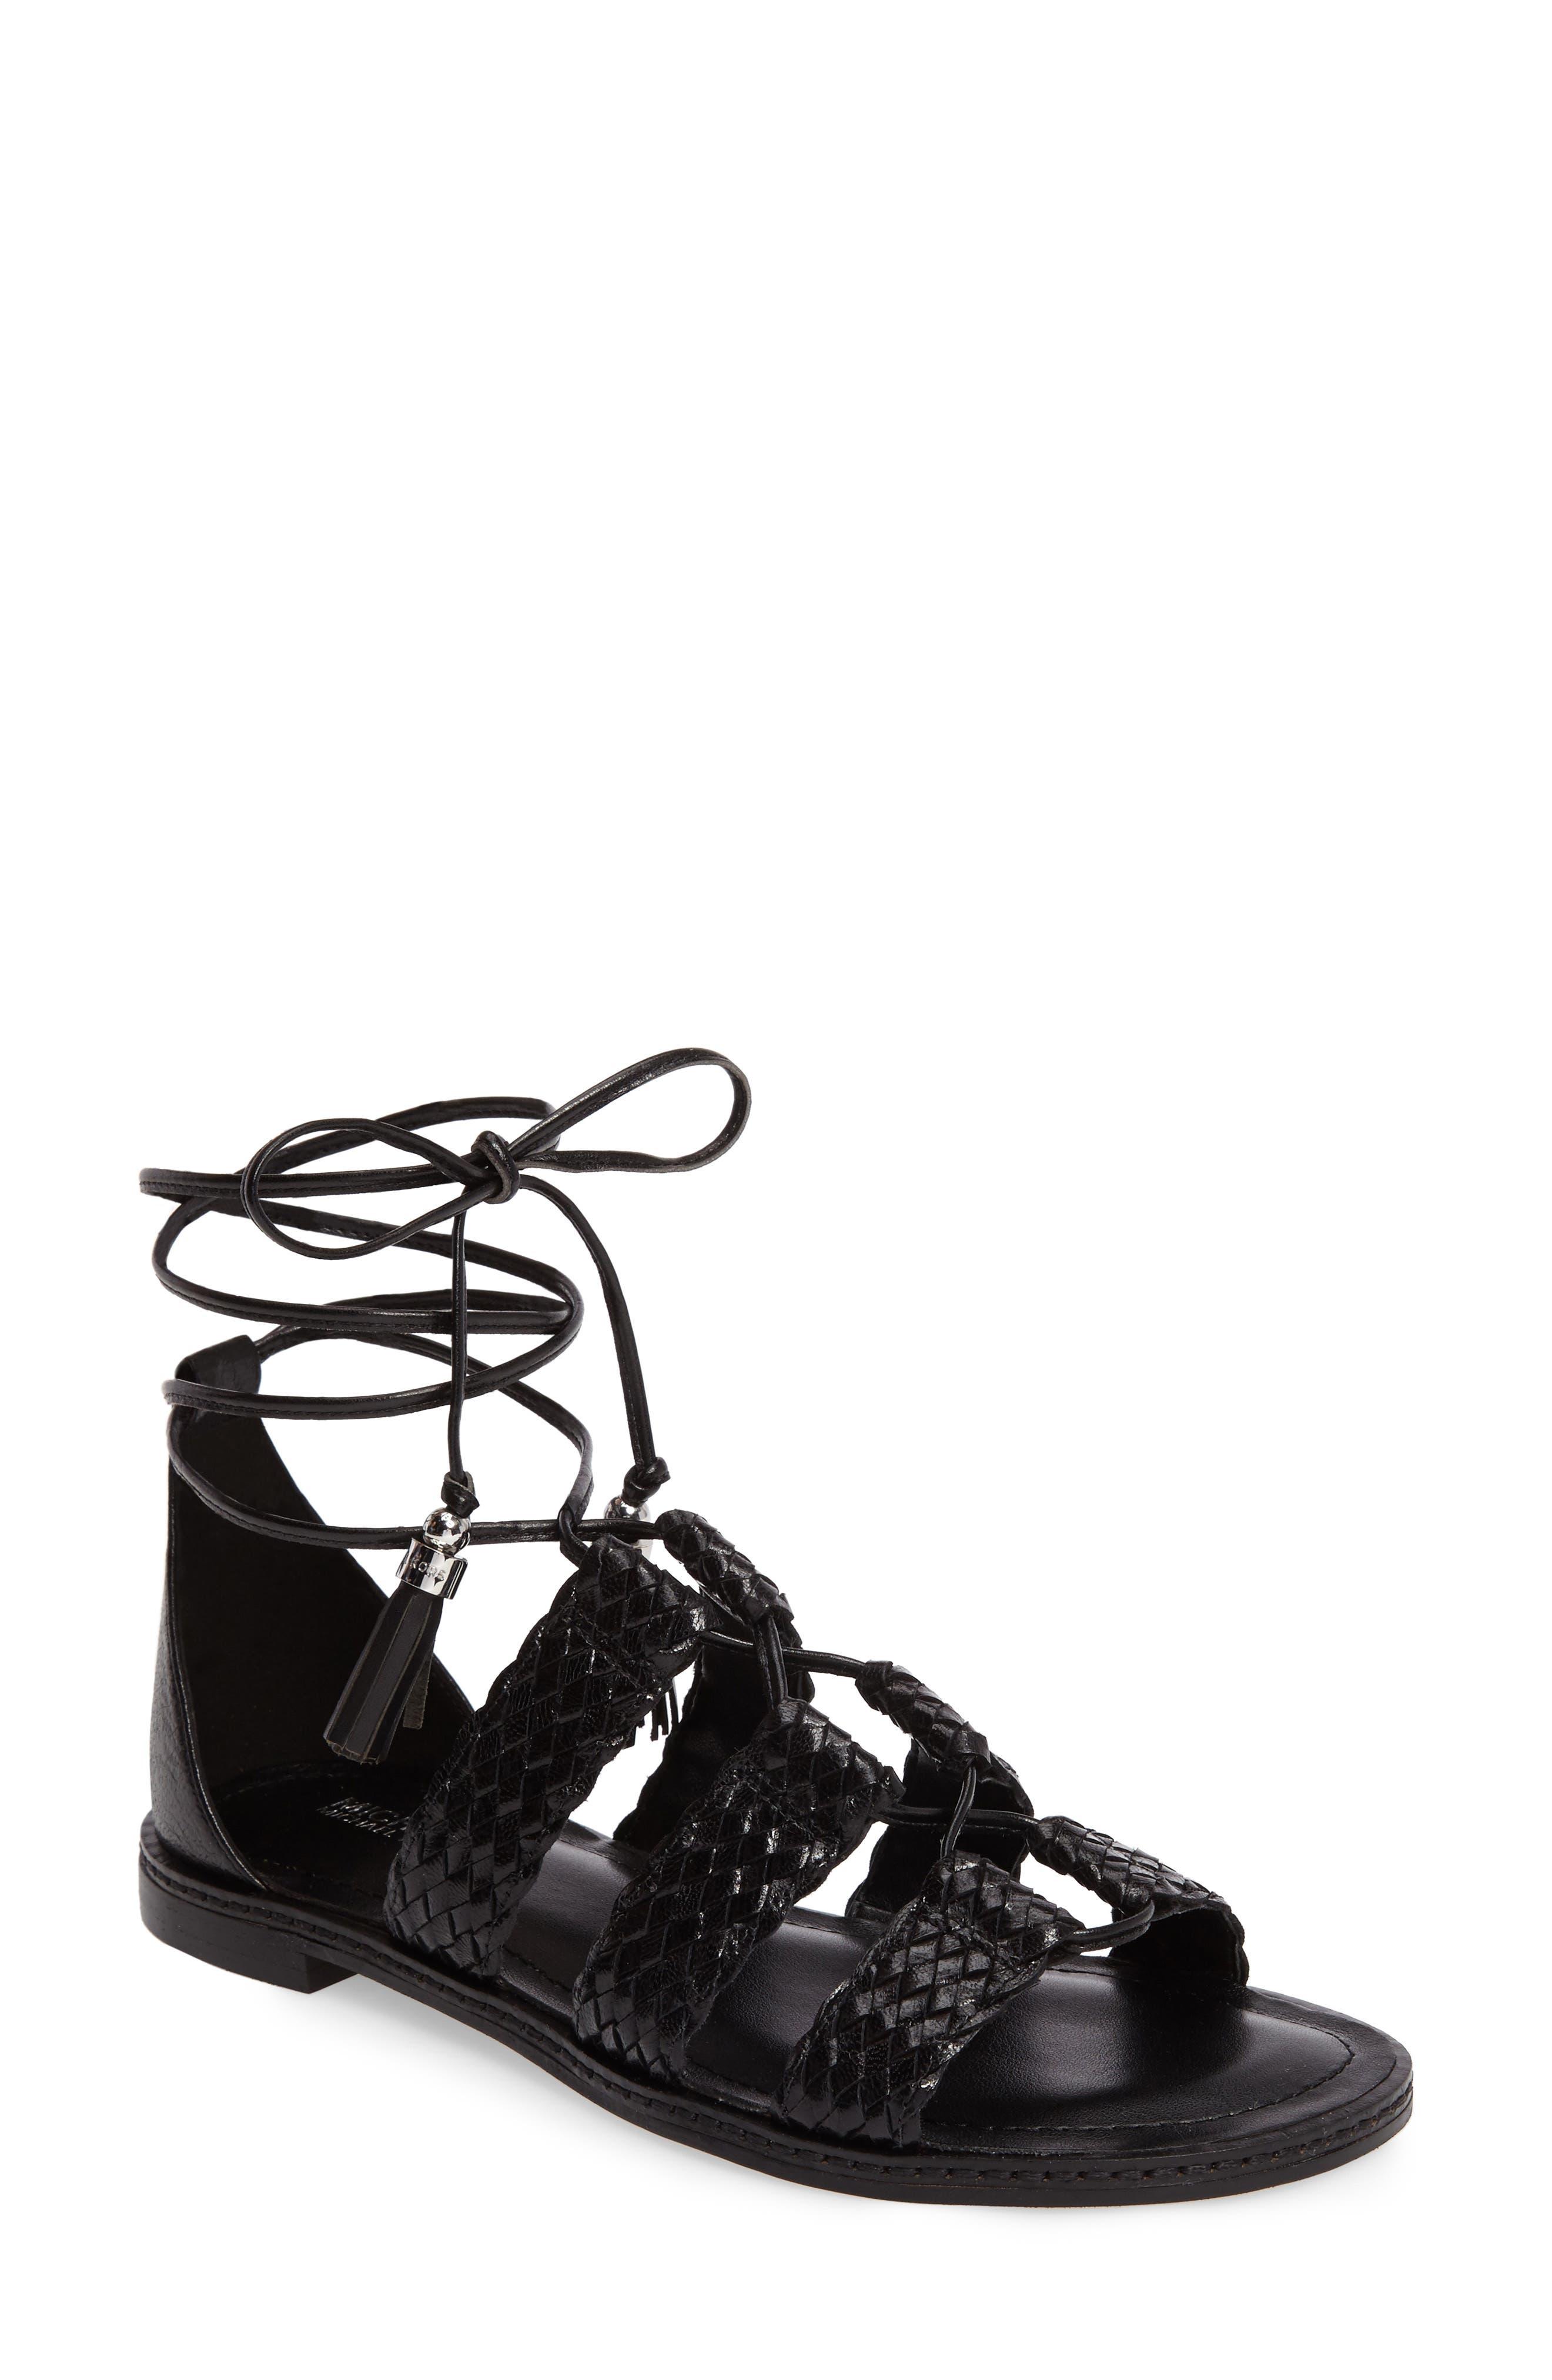 MICHAEL MICHAEL KORS Monterey Lace-Up Gladiator Sandal